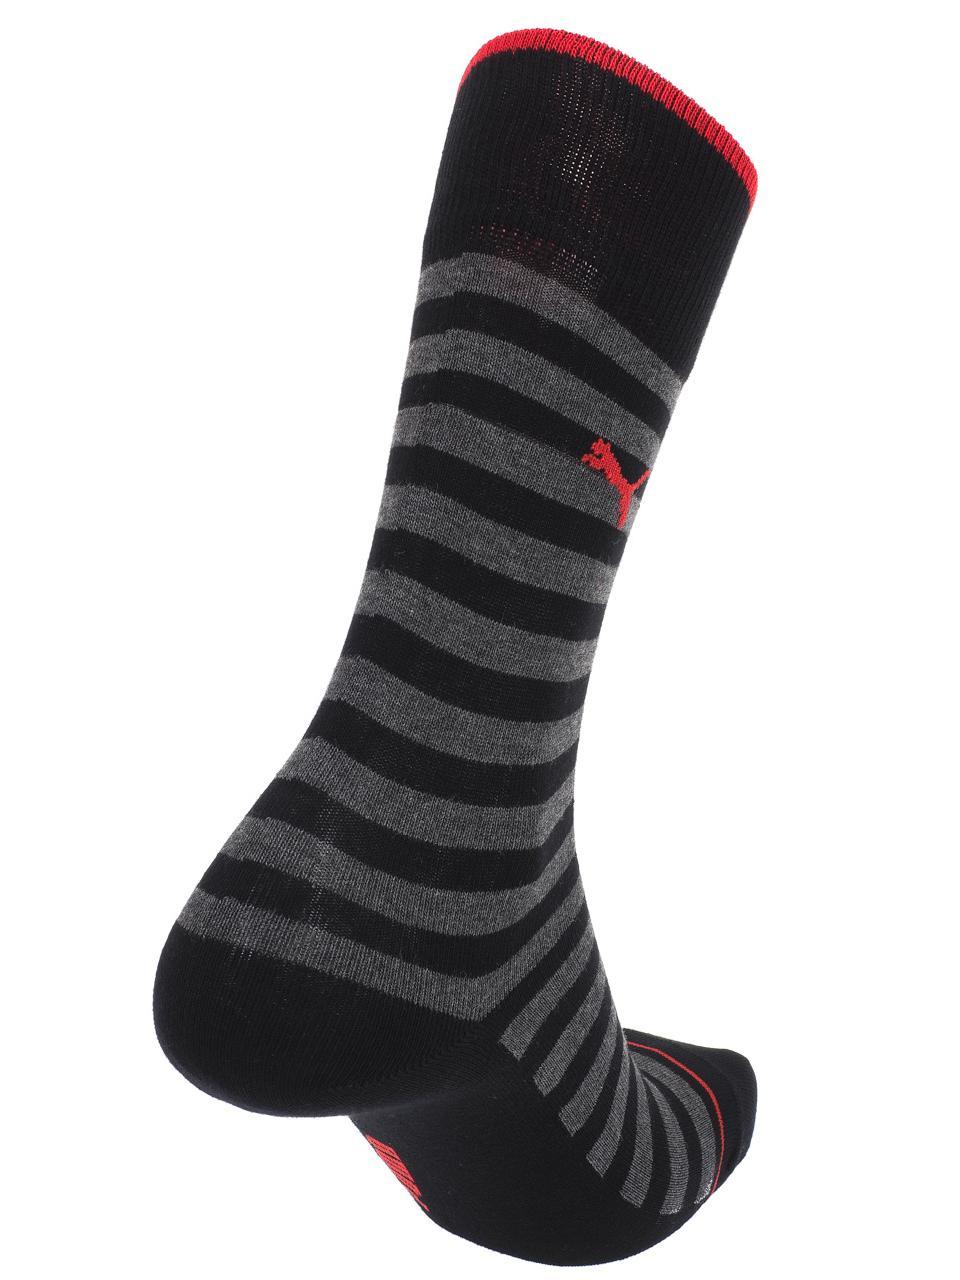 Chaussettes-Puma-Classic-black-stripes-x2-Noir-57037-Neuf miniature 2